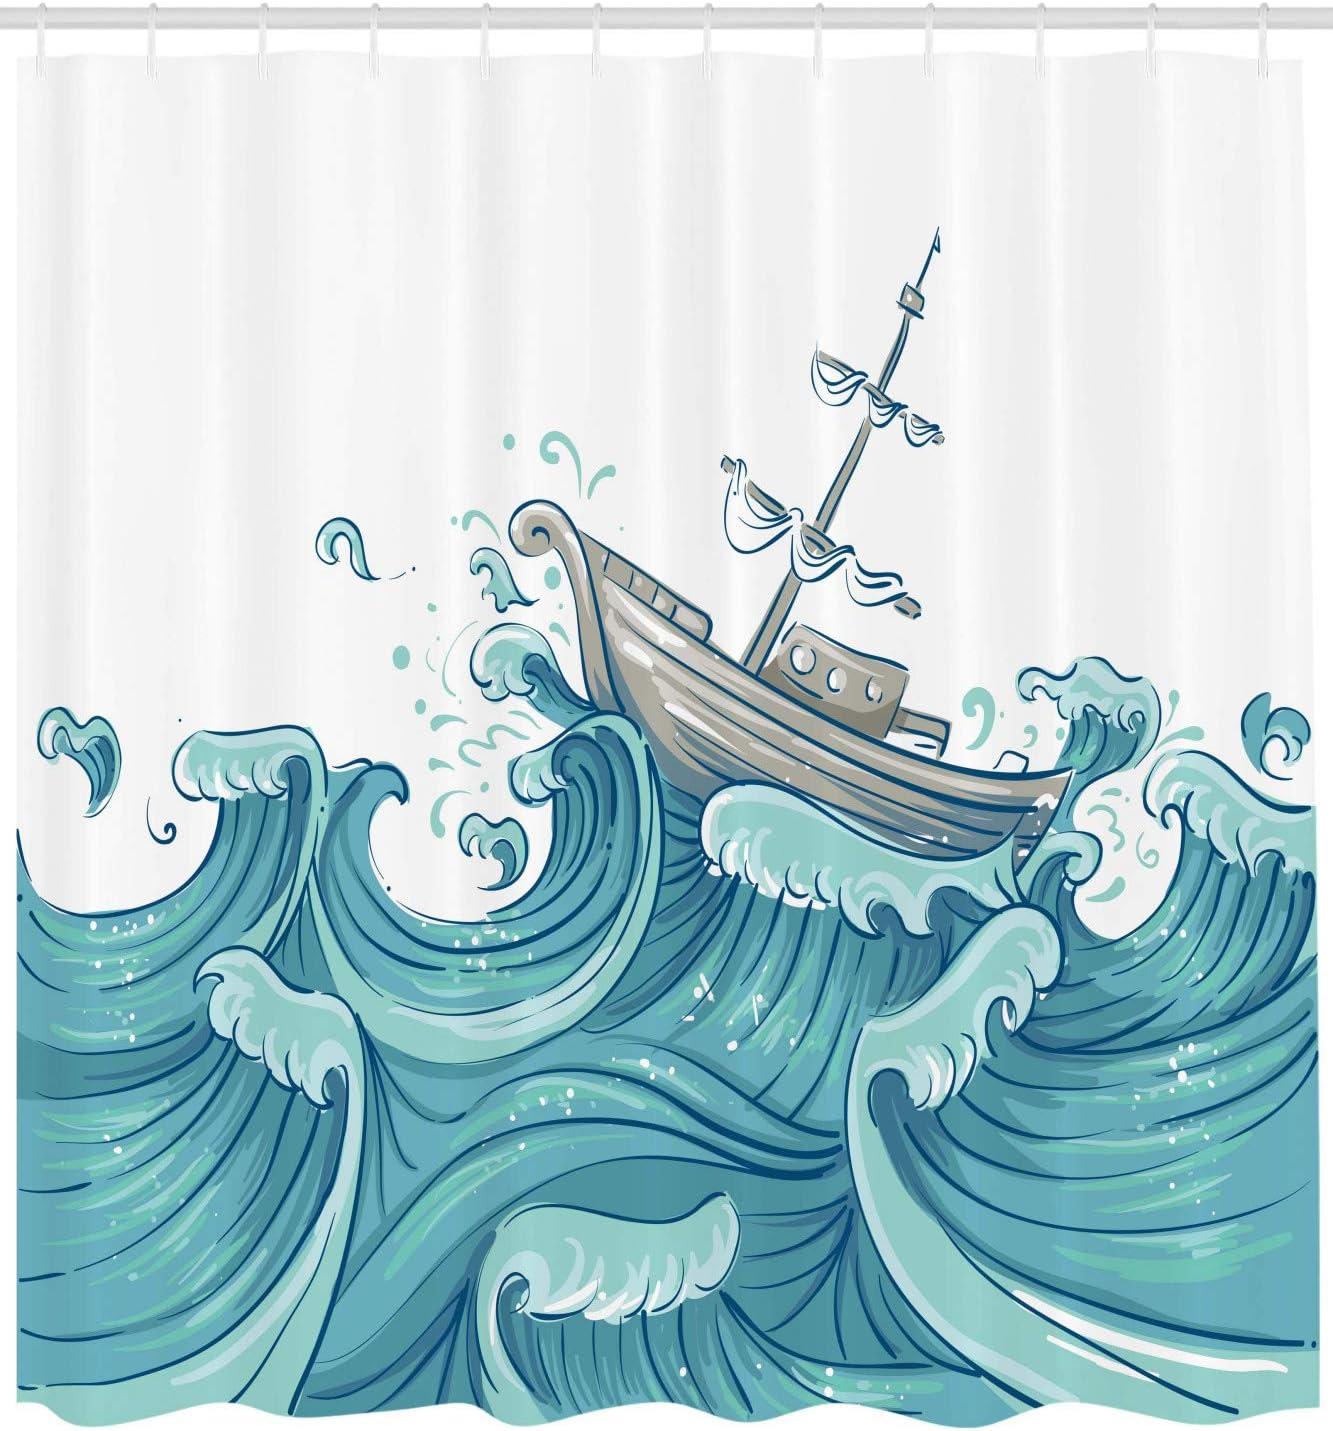 Ocean Shower Curtain Music Nautical Melody Print for Bathroom